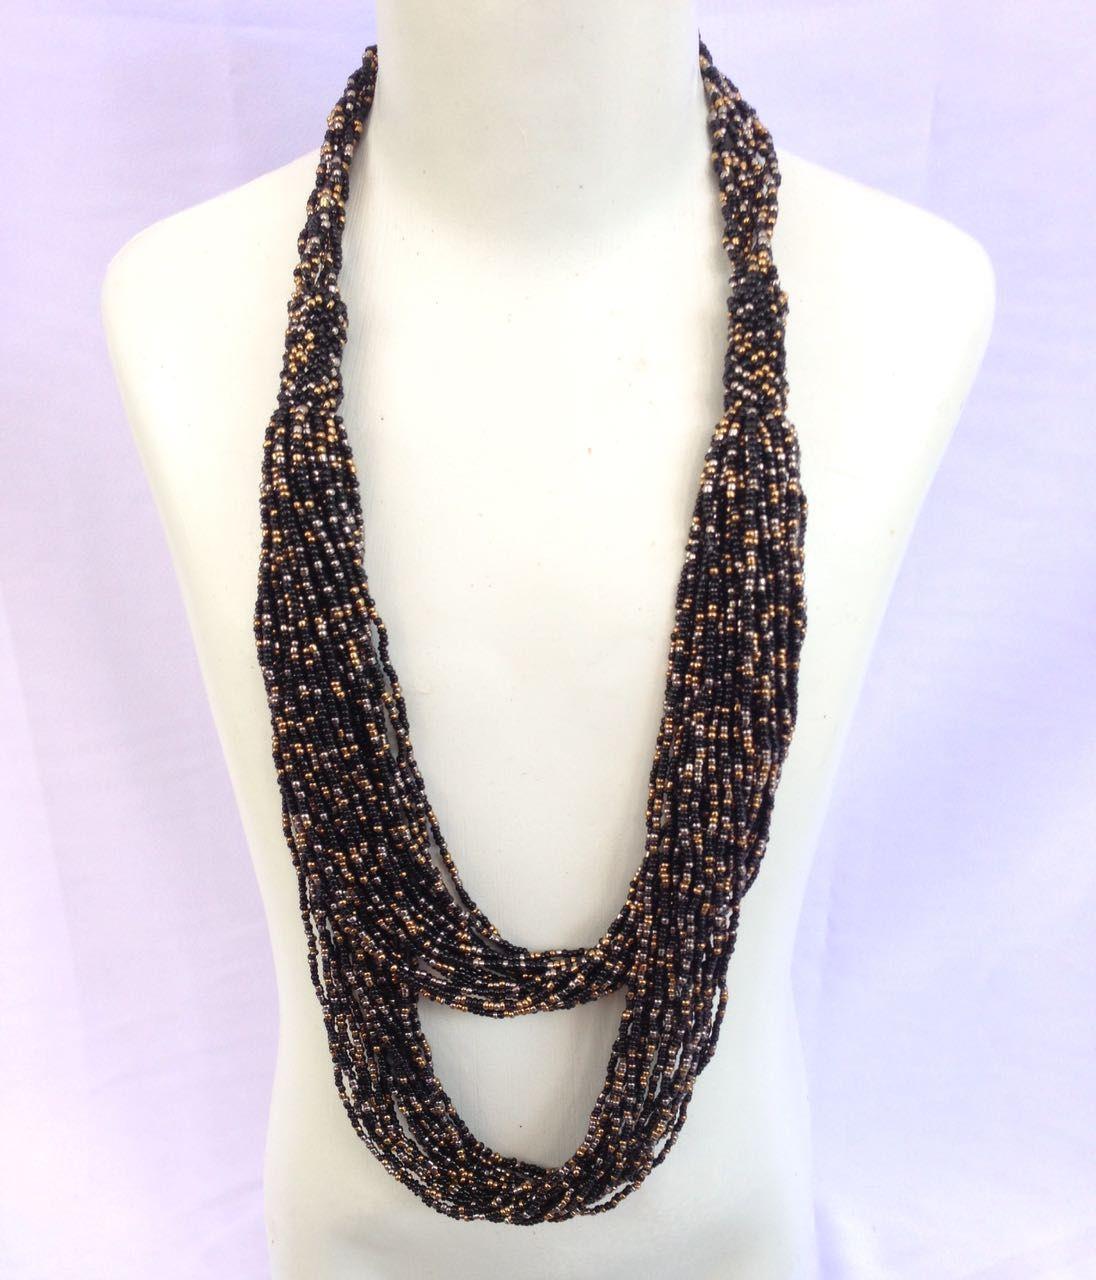 Kalung manik-manik fashion wanita etnik dua susun